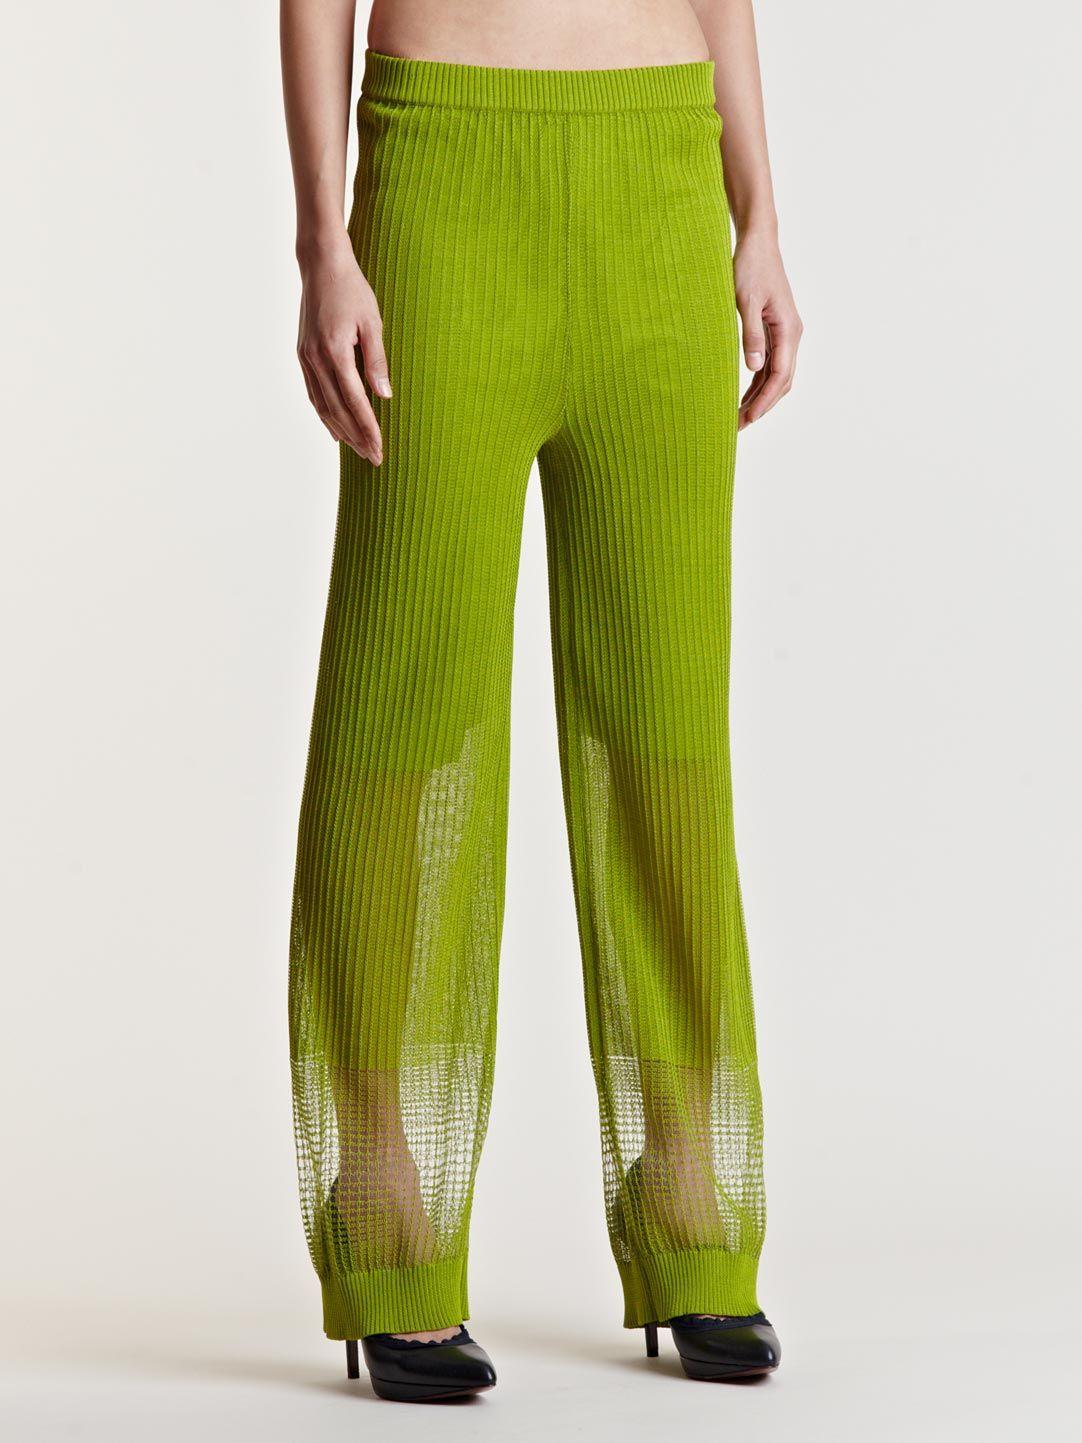 LN-CC Lucas Nascimento Women's Sheer Degrade Pants